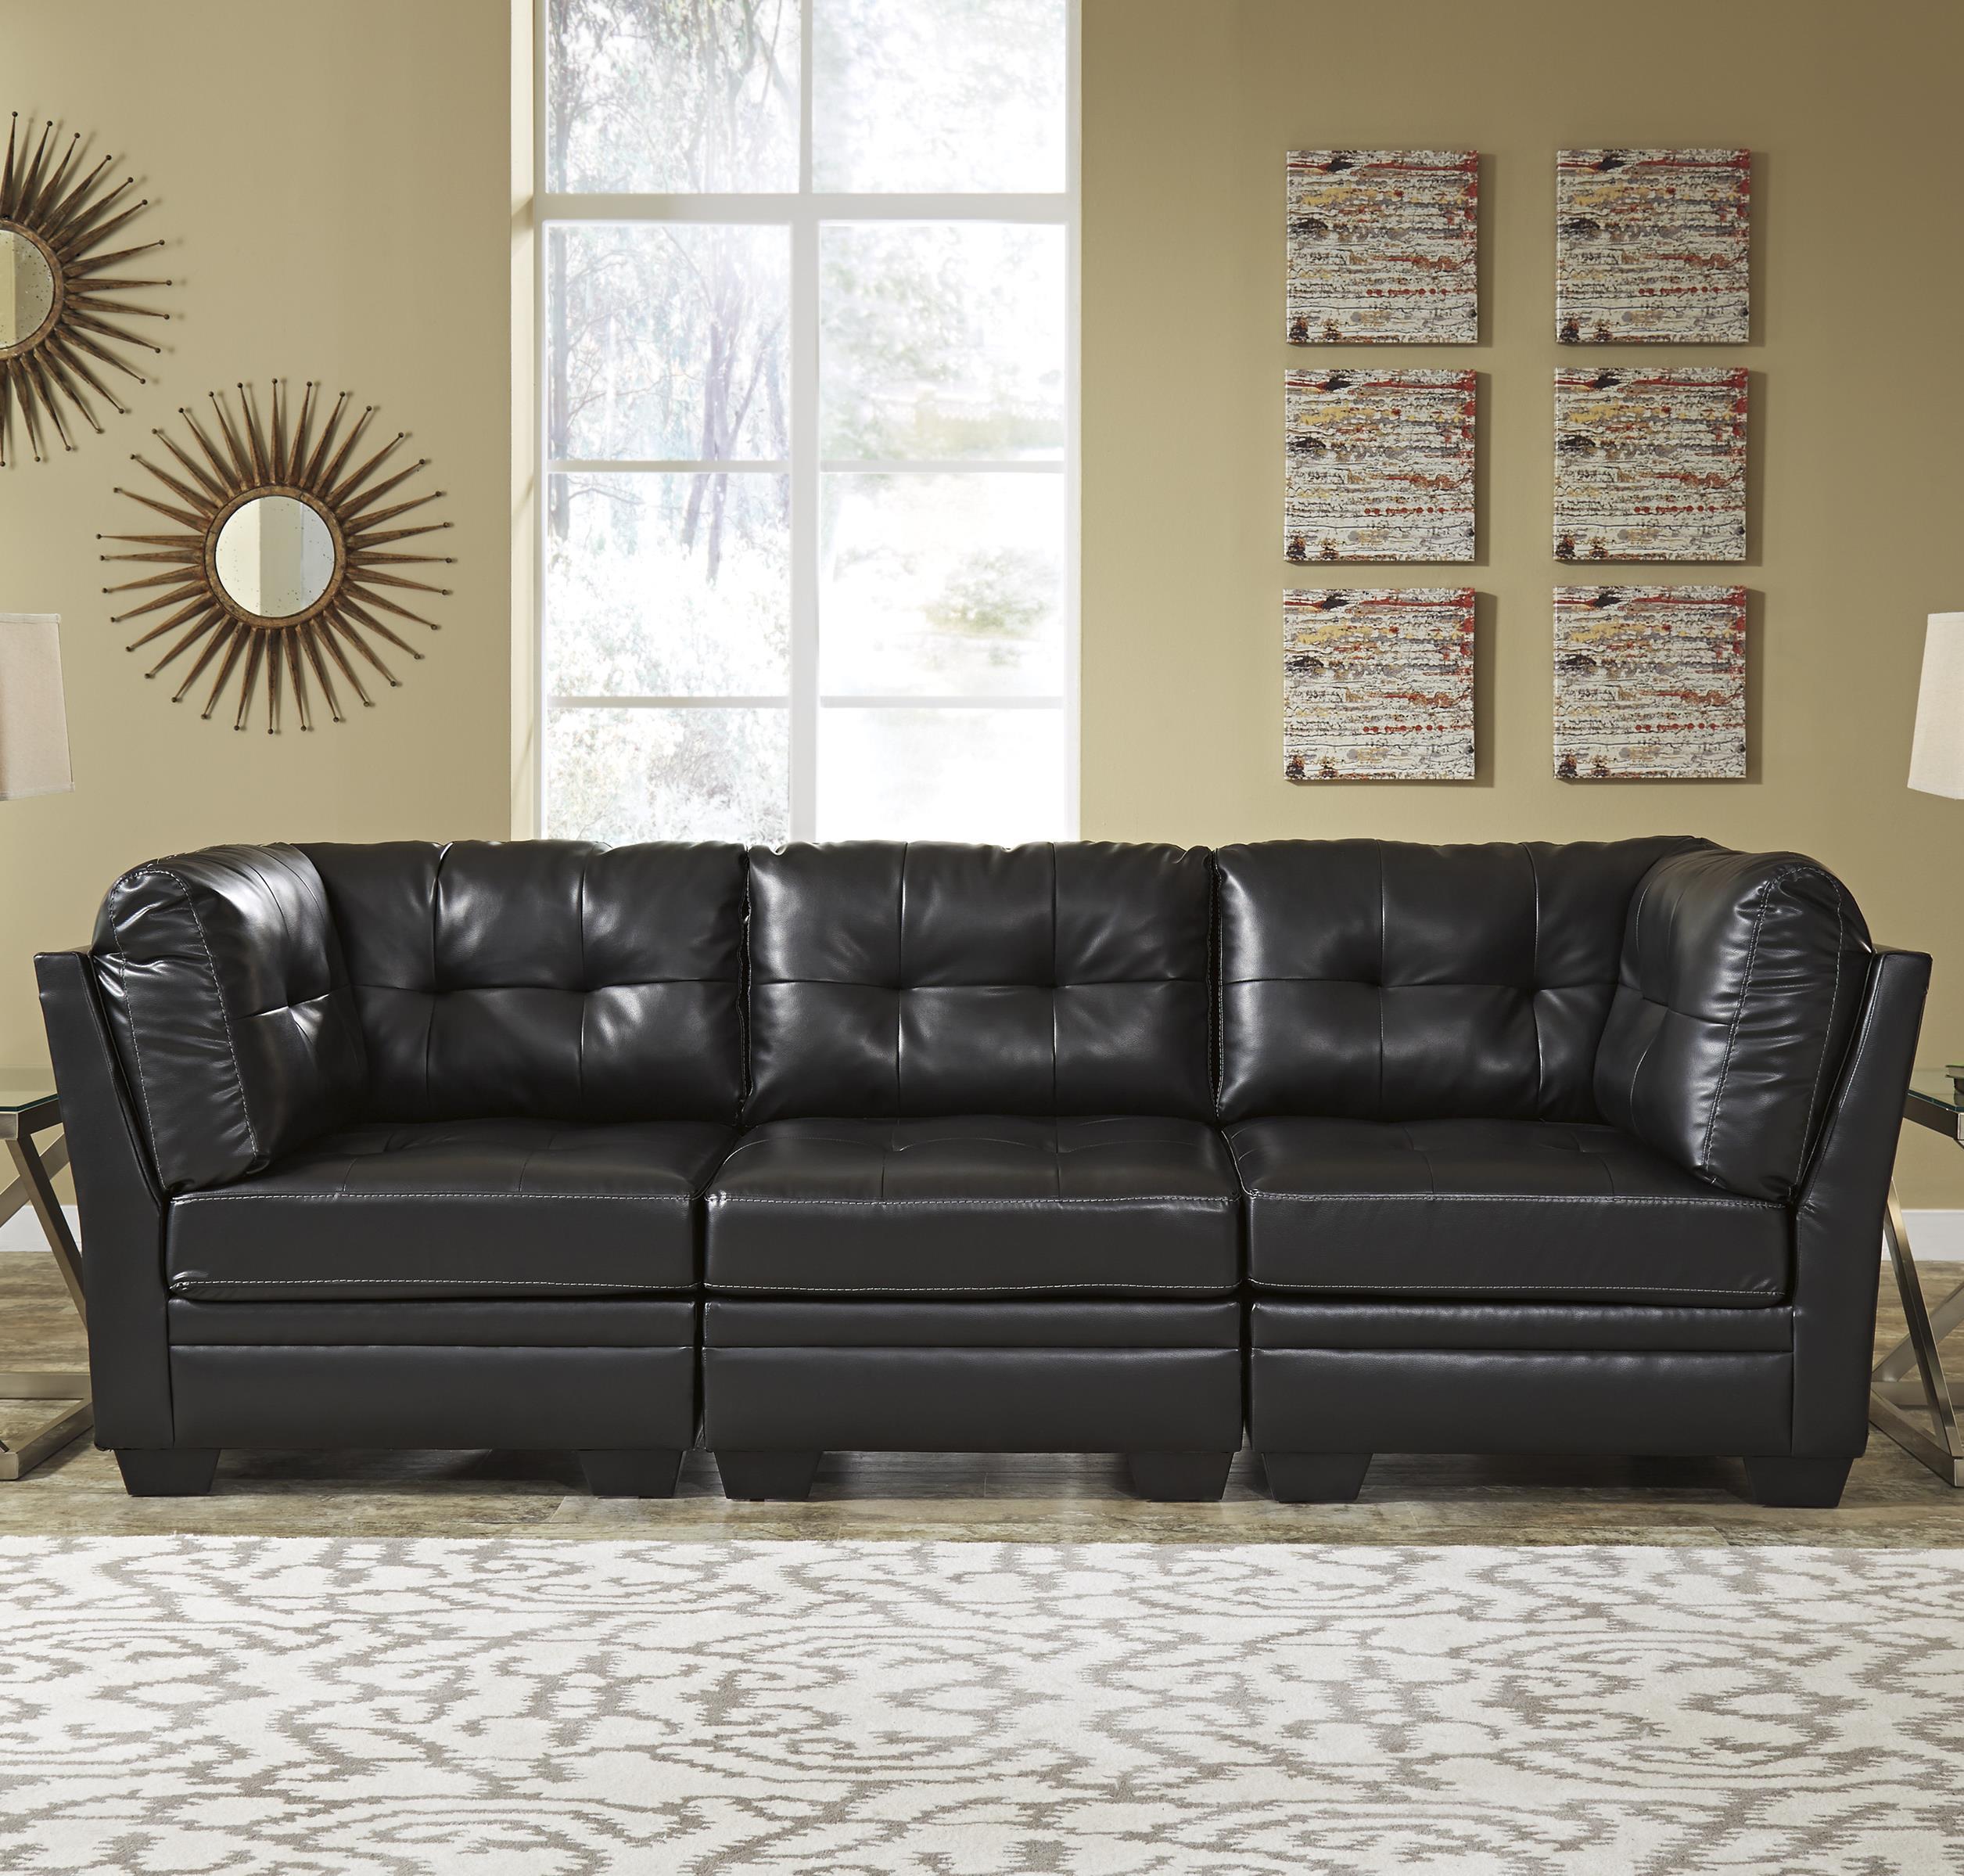 Signature Design by Ashley Khalil DuraBlend® Modular Sofa - Item Number: 6180546+2x51